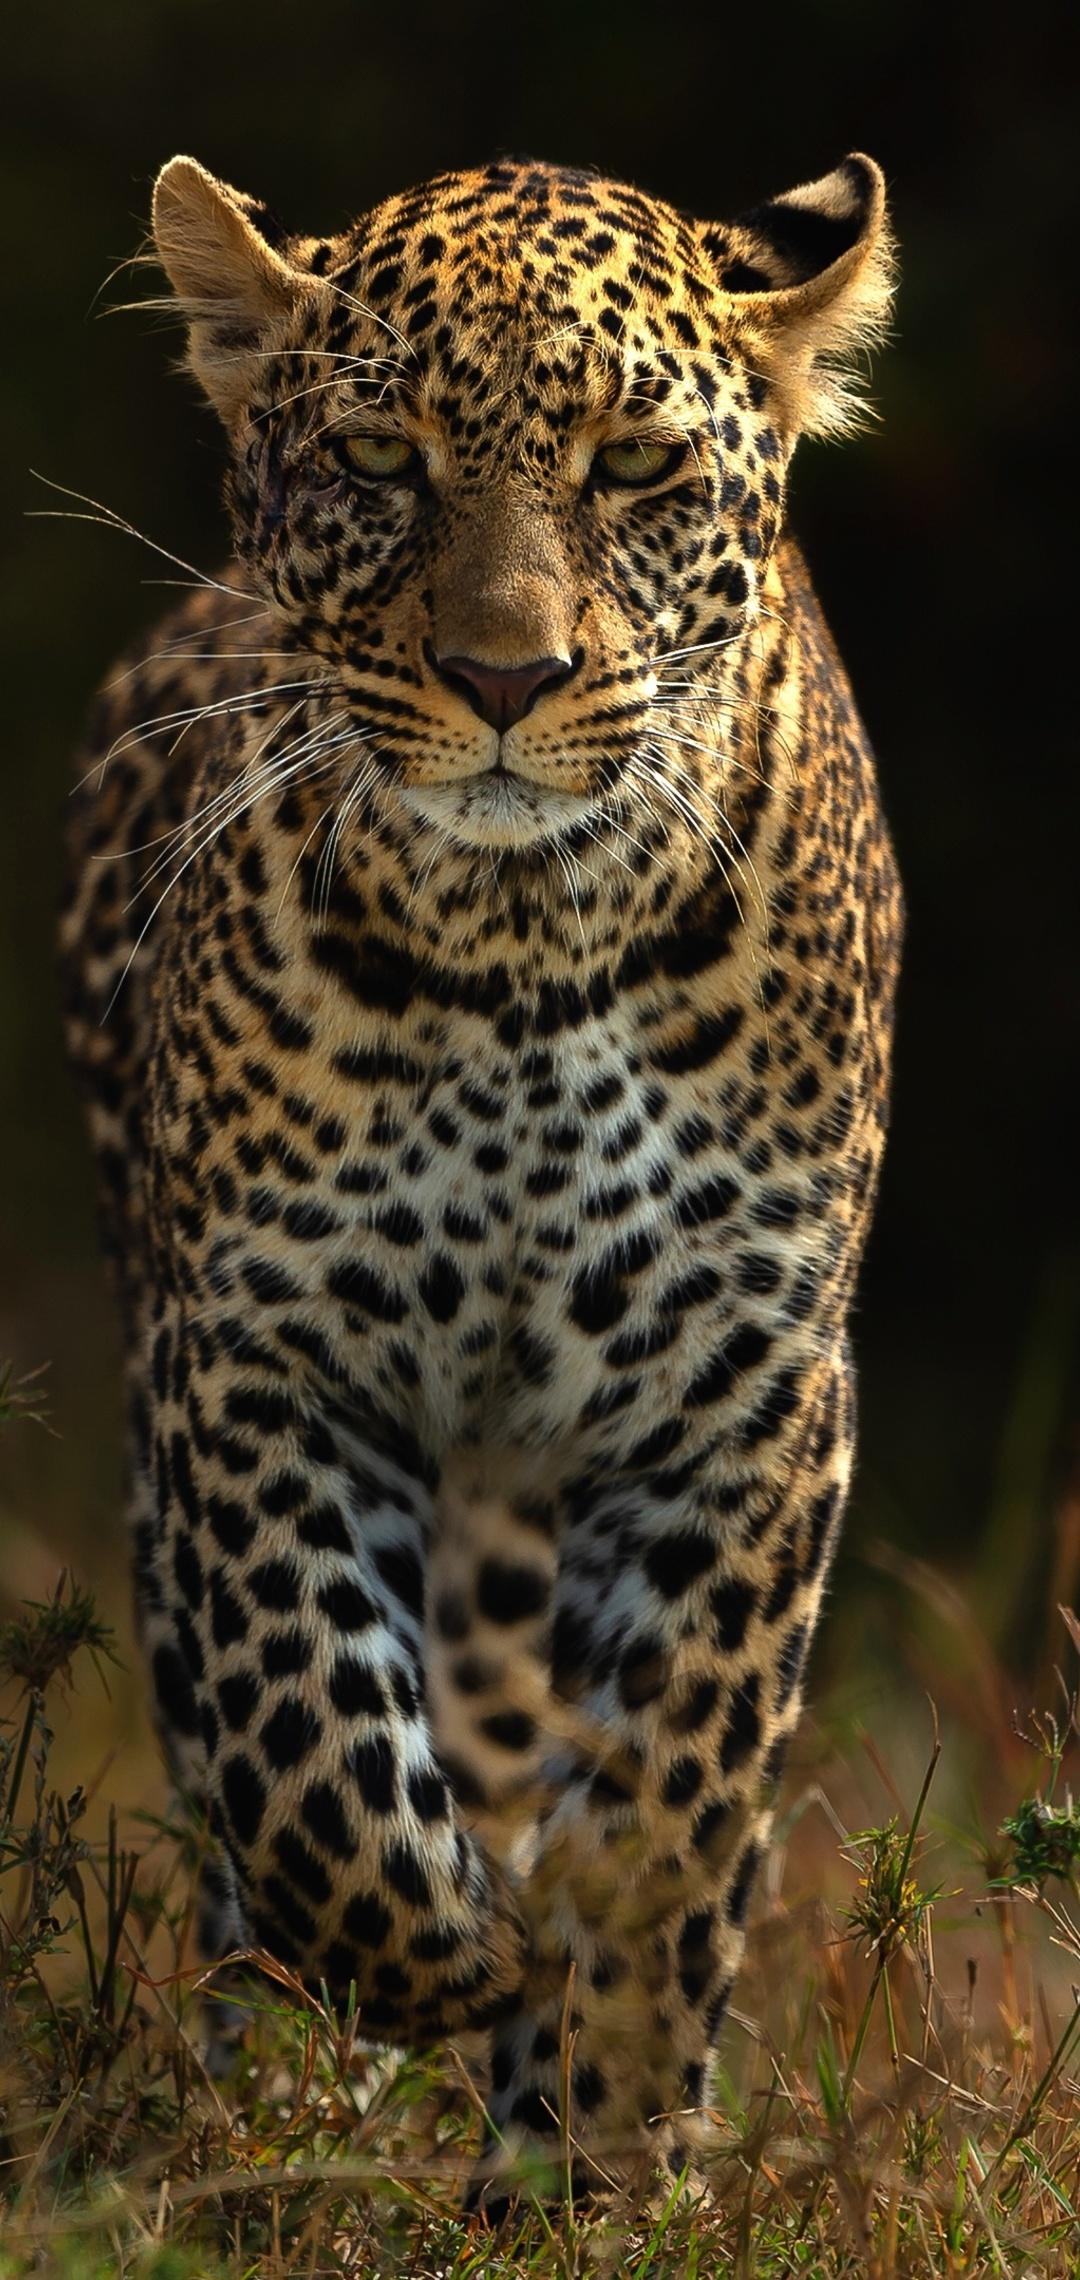 leopards-4k-bh.jpg